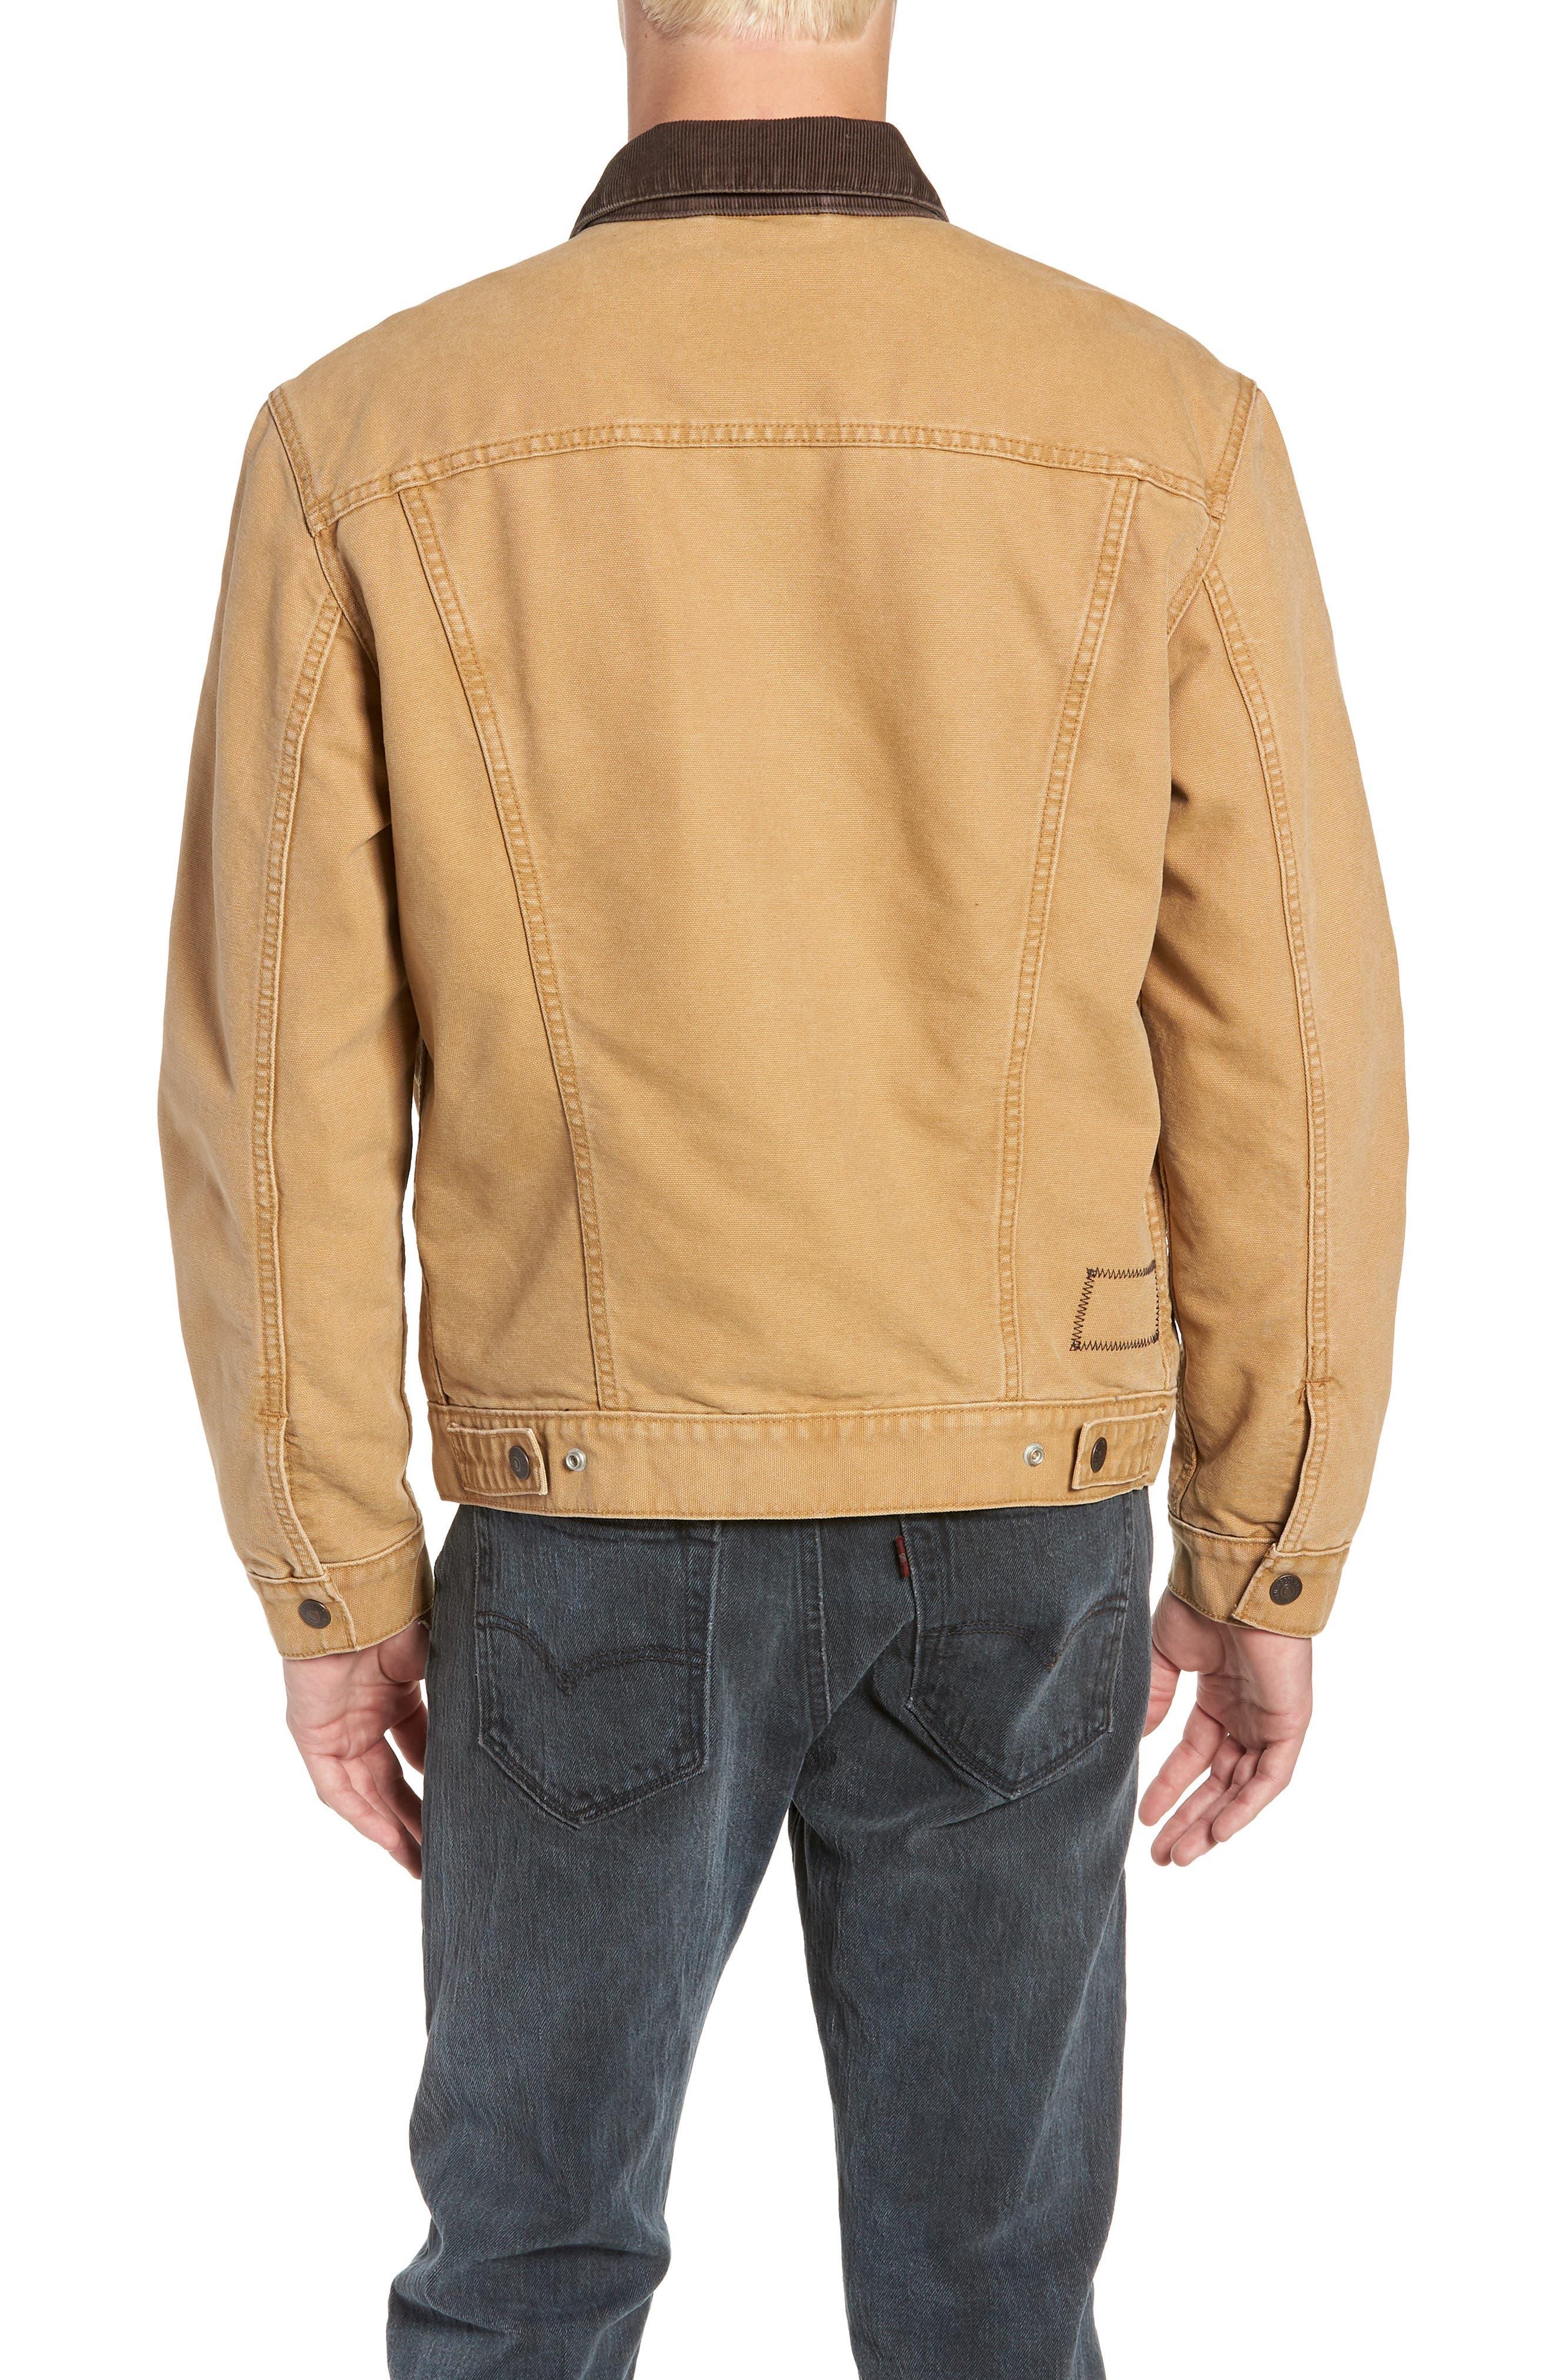 x Justin Timberlake Canvas Trucker Jacket,                             Alternate thumbnail 3, color,                             DIJON